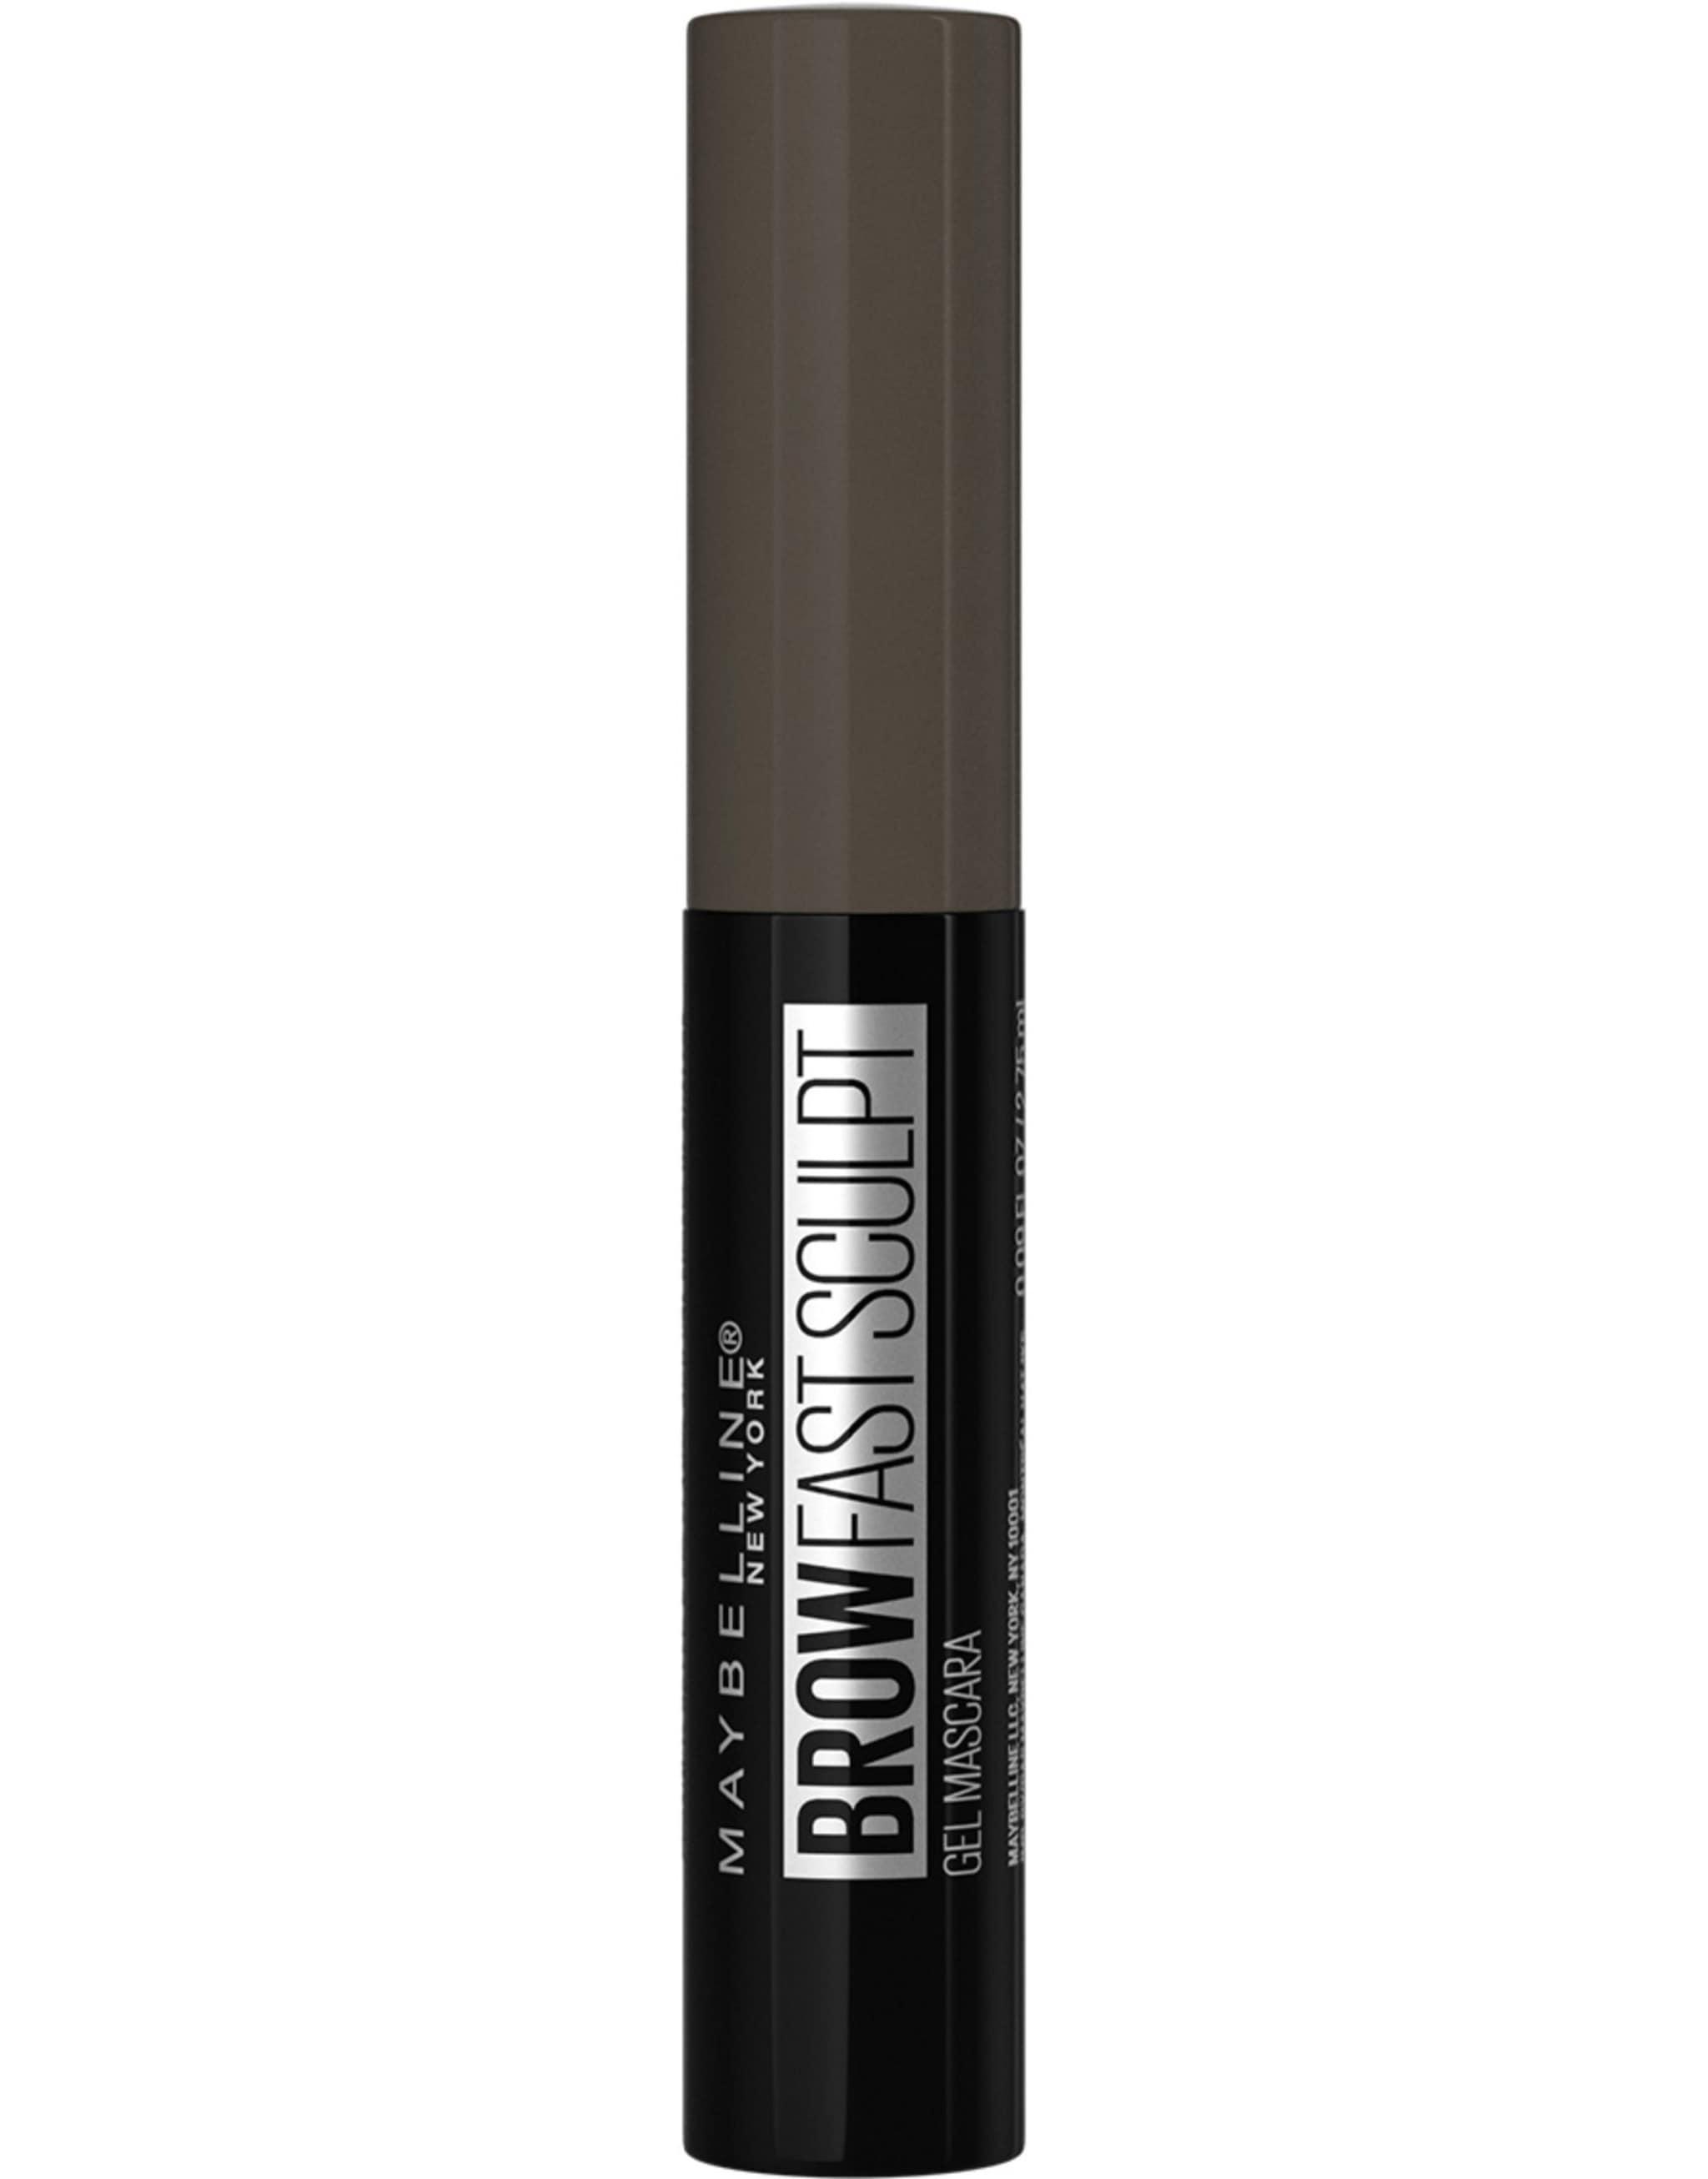 Maybelline Brow Fast Sculpt Eyebrow Gel 04 Medium Brown 5